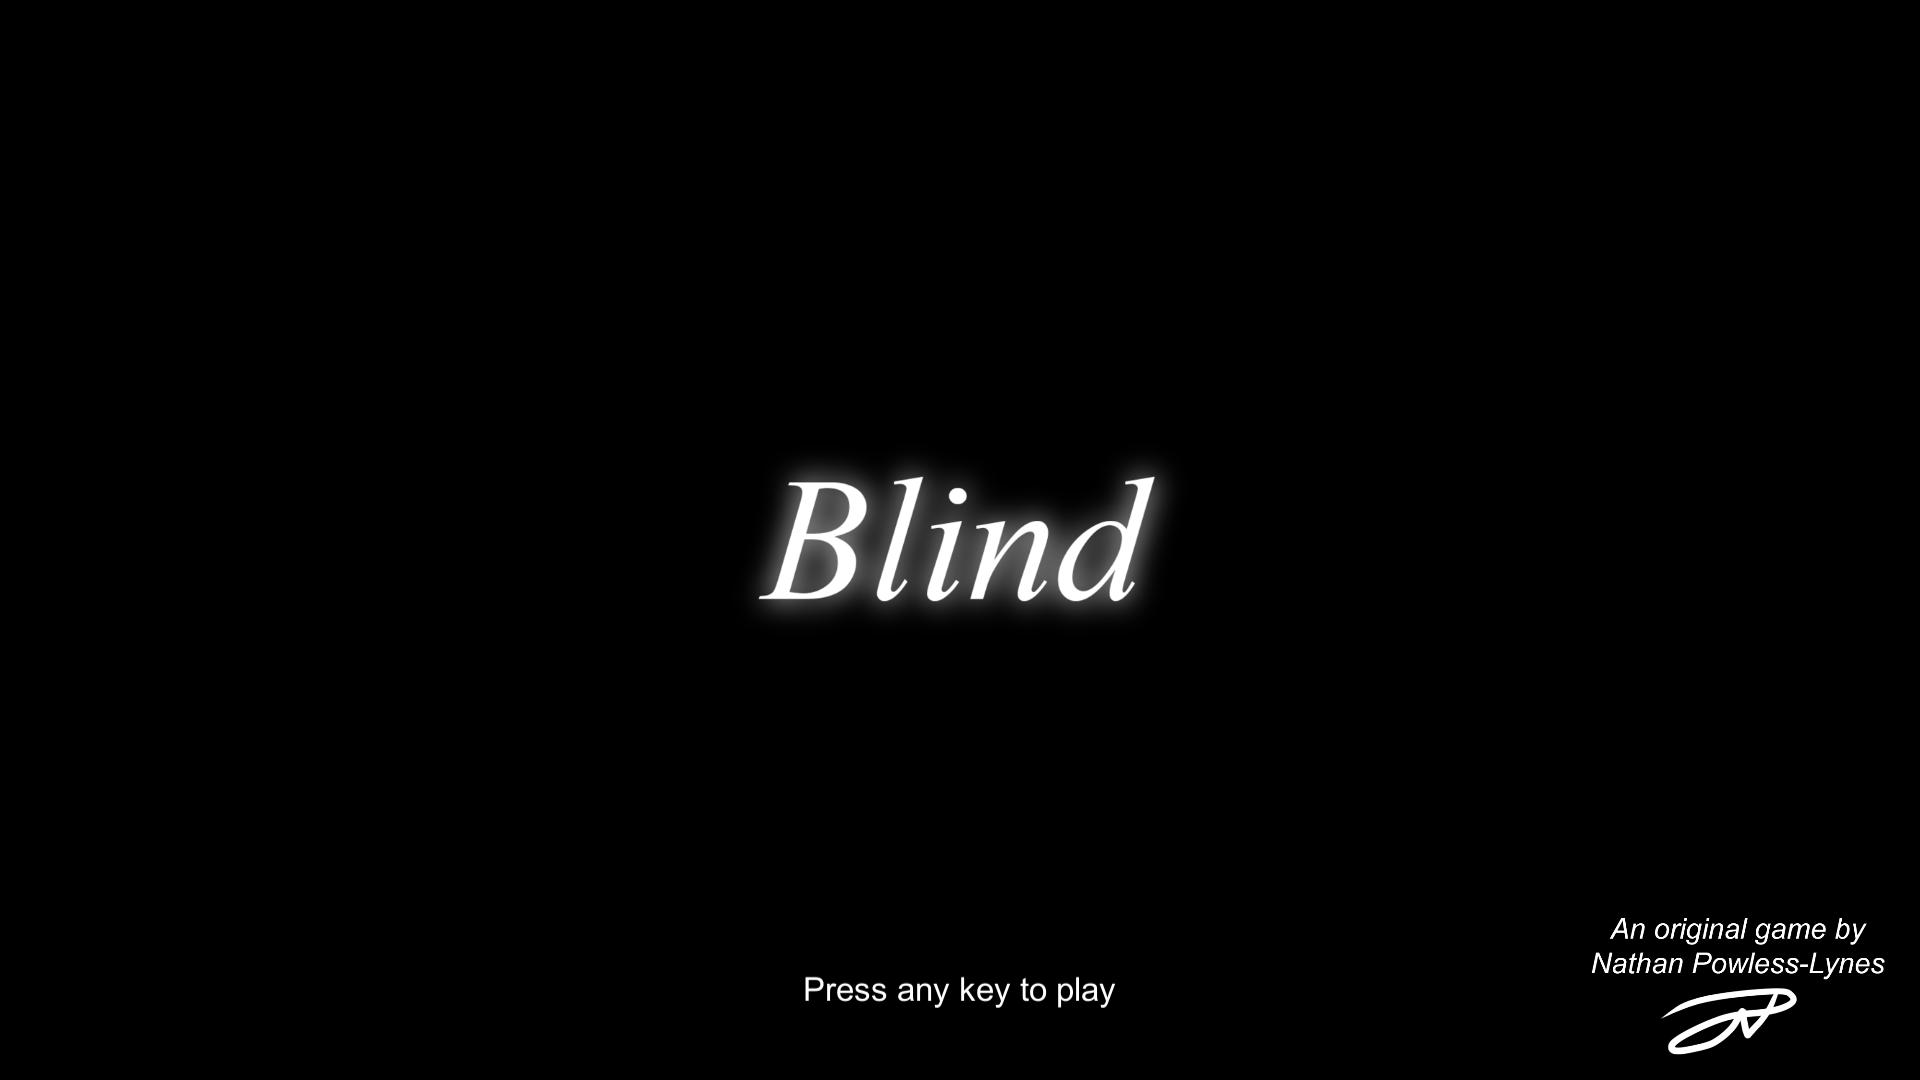 nevidiaci